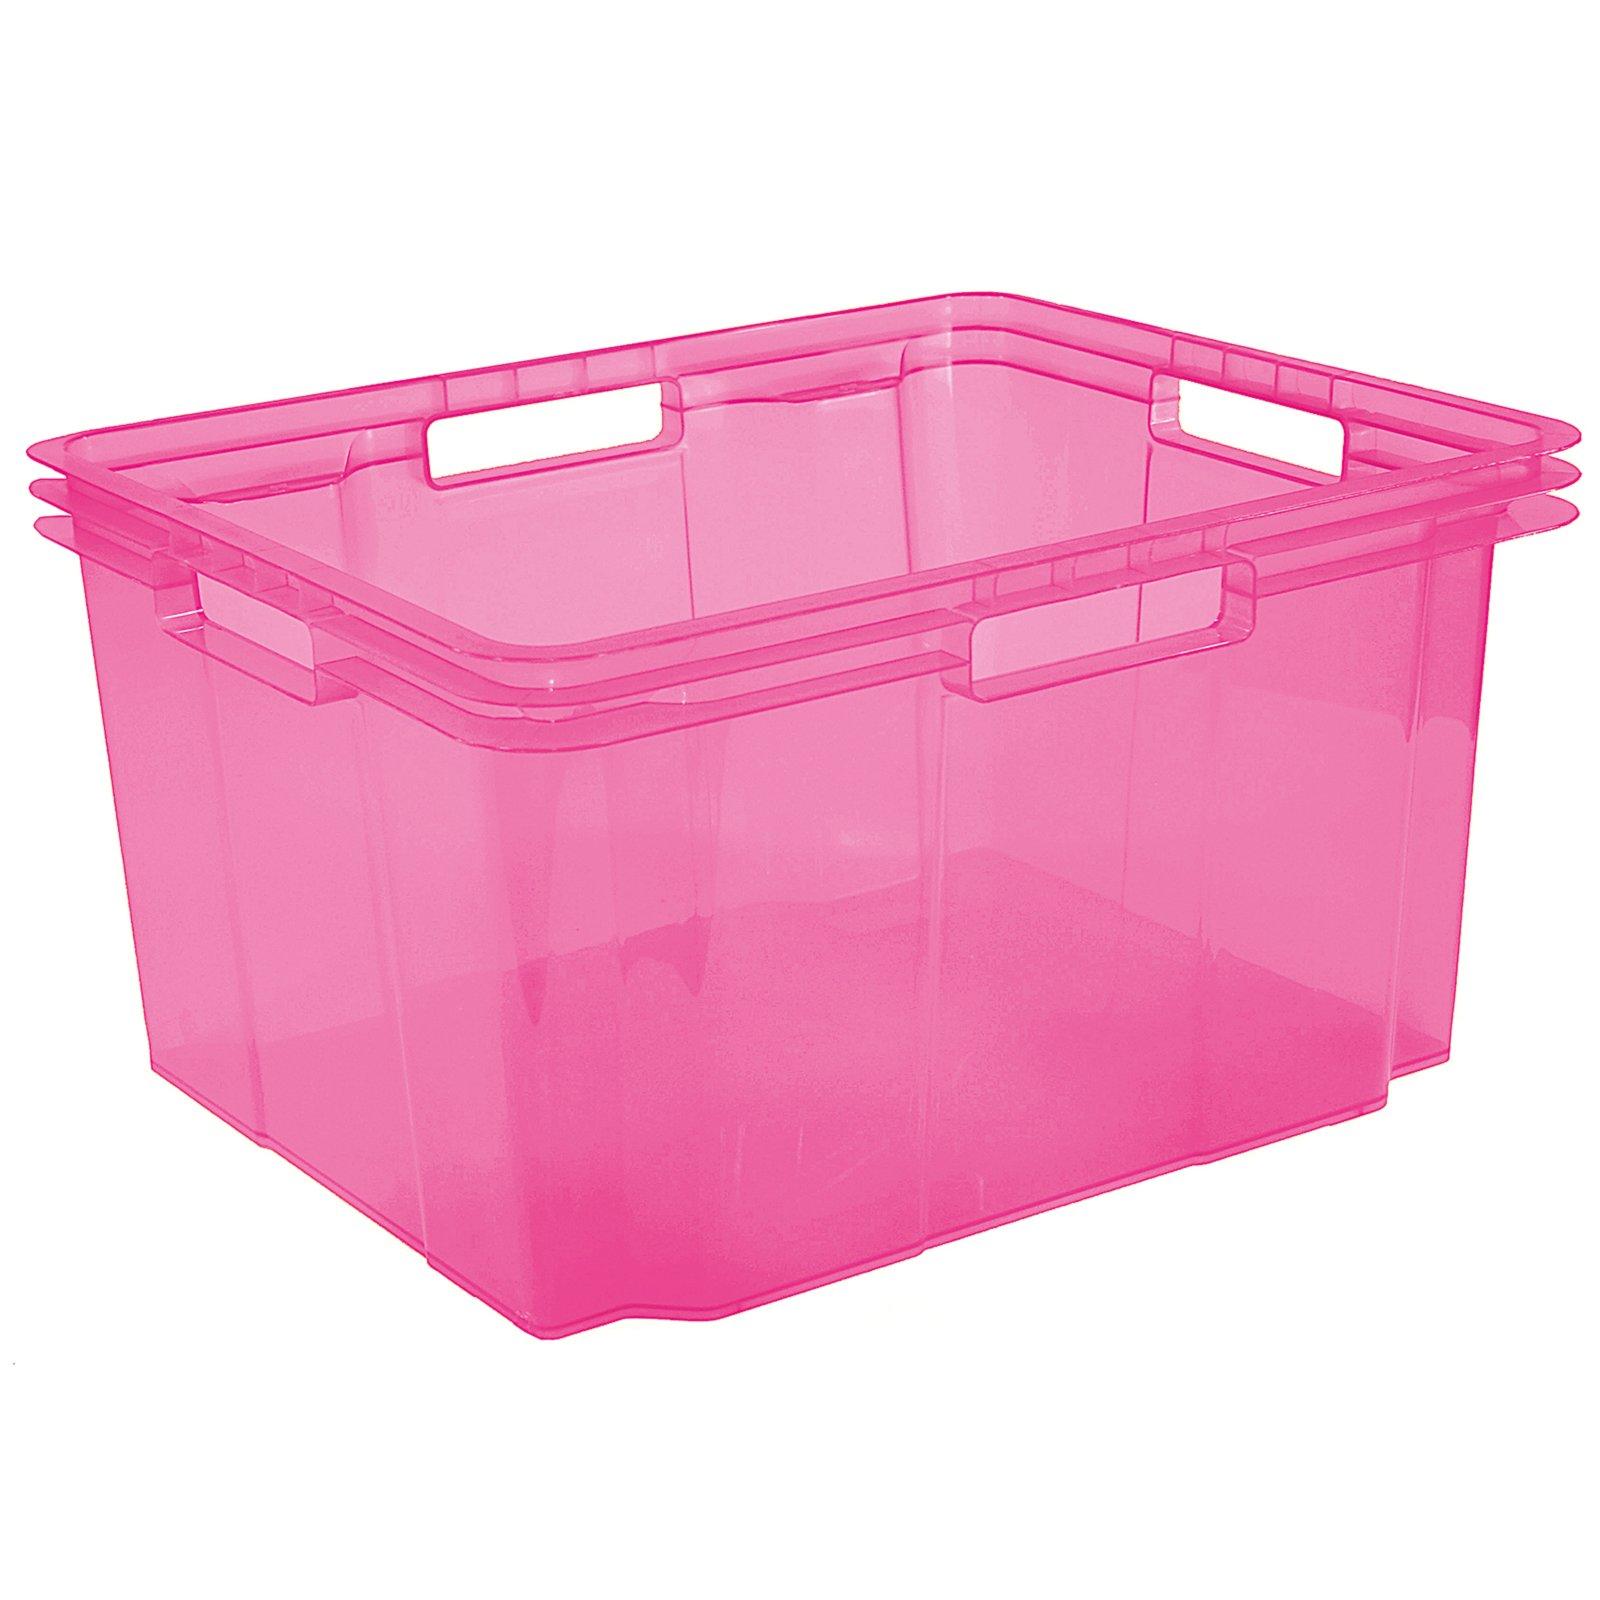 Stapelbox - pink pastell - 26 Liter